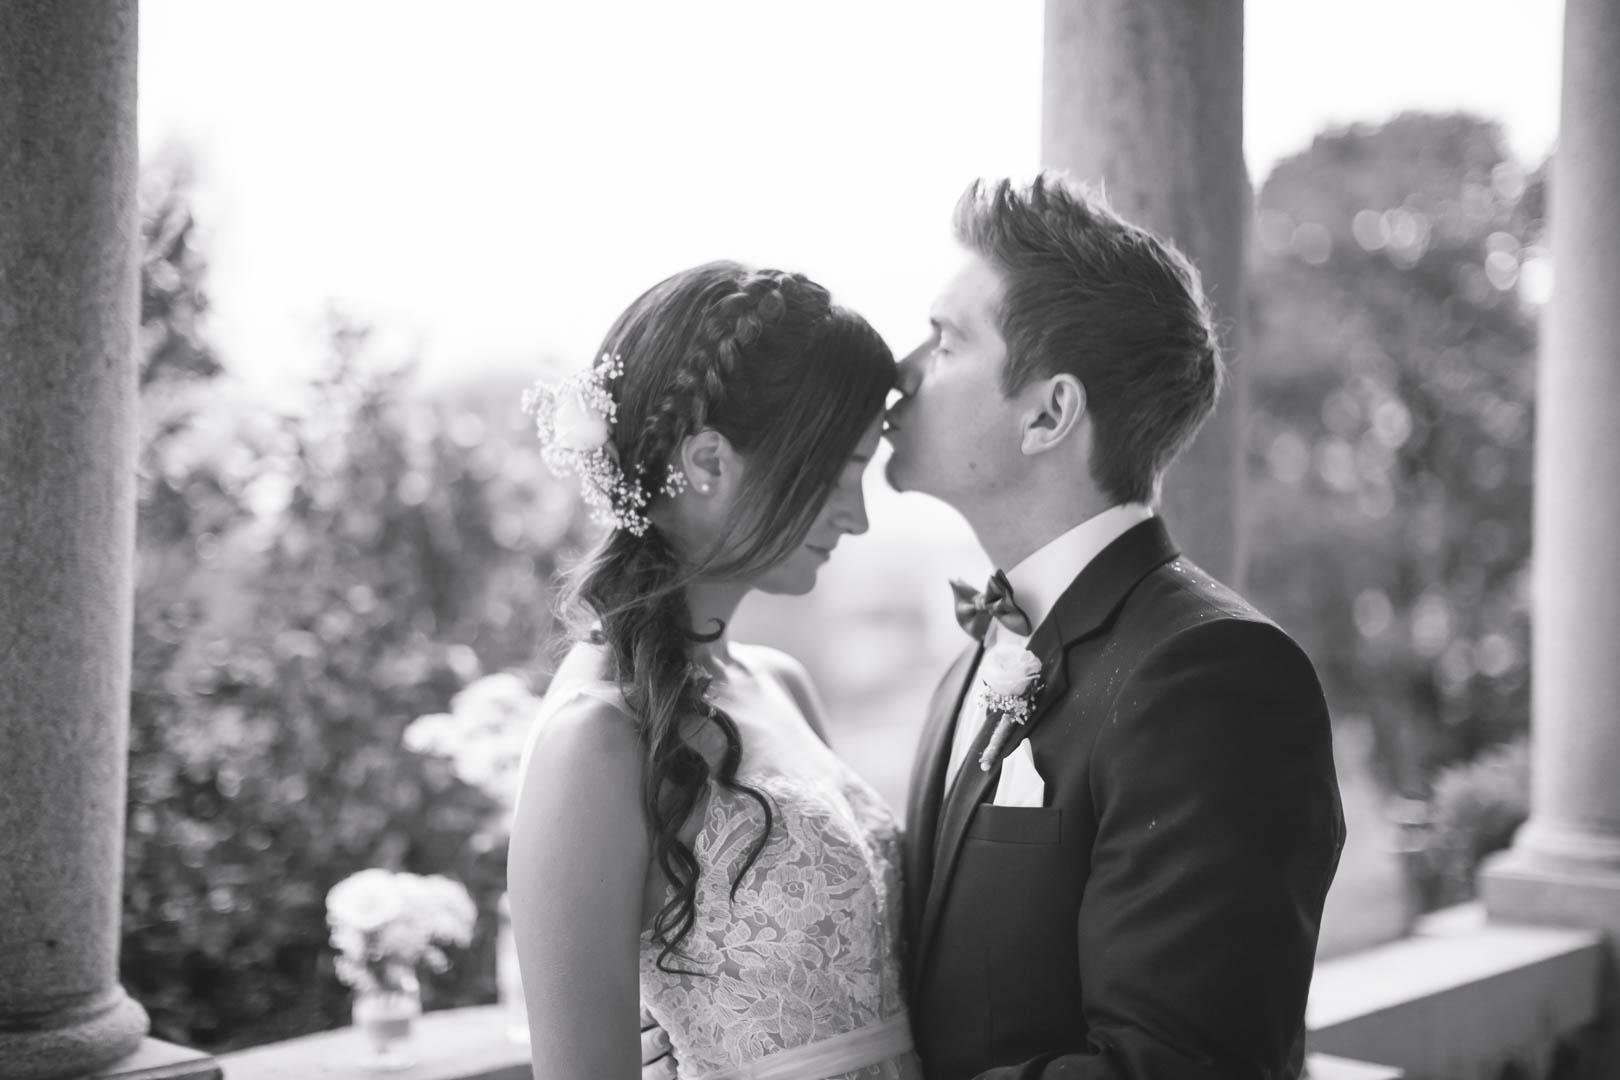 Hochzeit Tessin Fotoshooting The Wedding Day LittleCITY